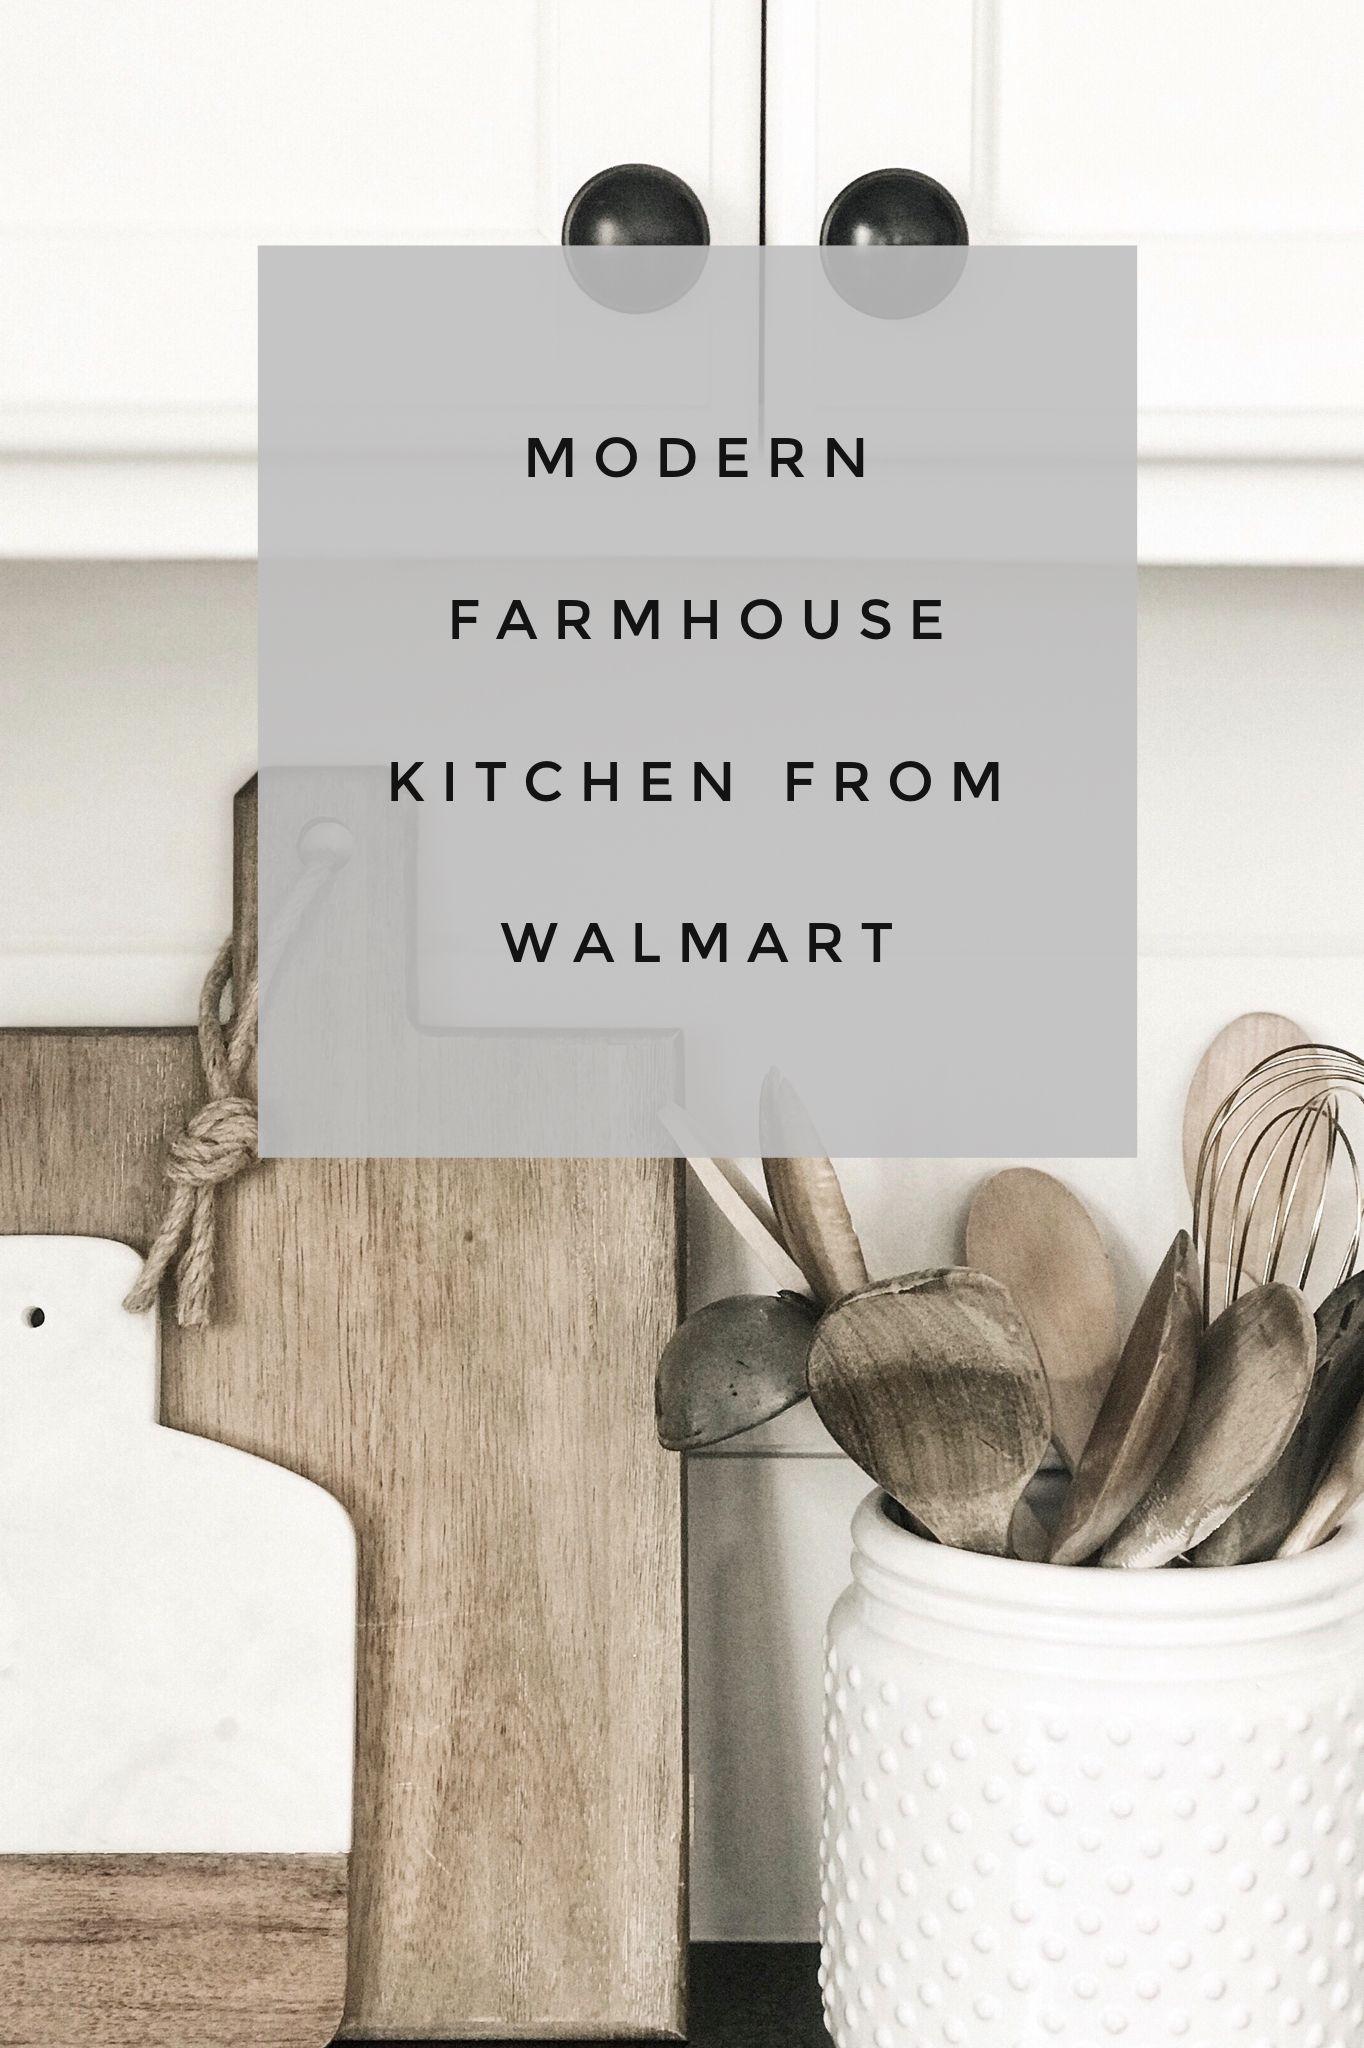 Modern farmhouse kitchen from Walmart!